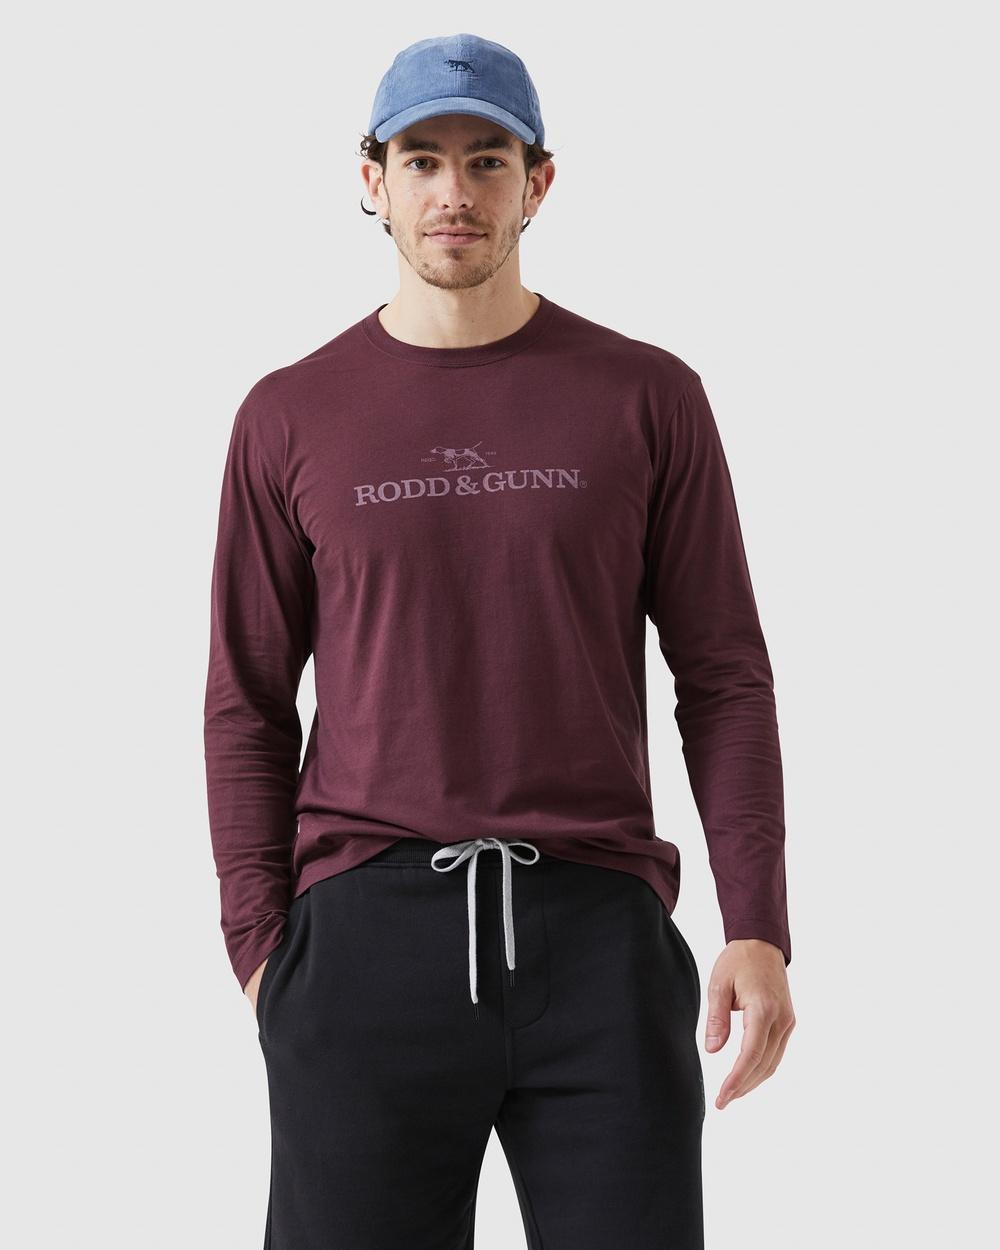 Rodd & Gunn Ls Logo T Shirt T-Shirts Singlets Port T-Shirt Australia